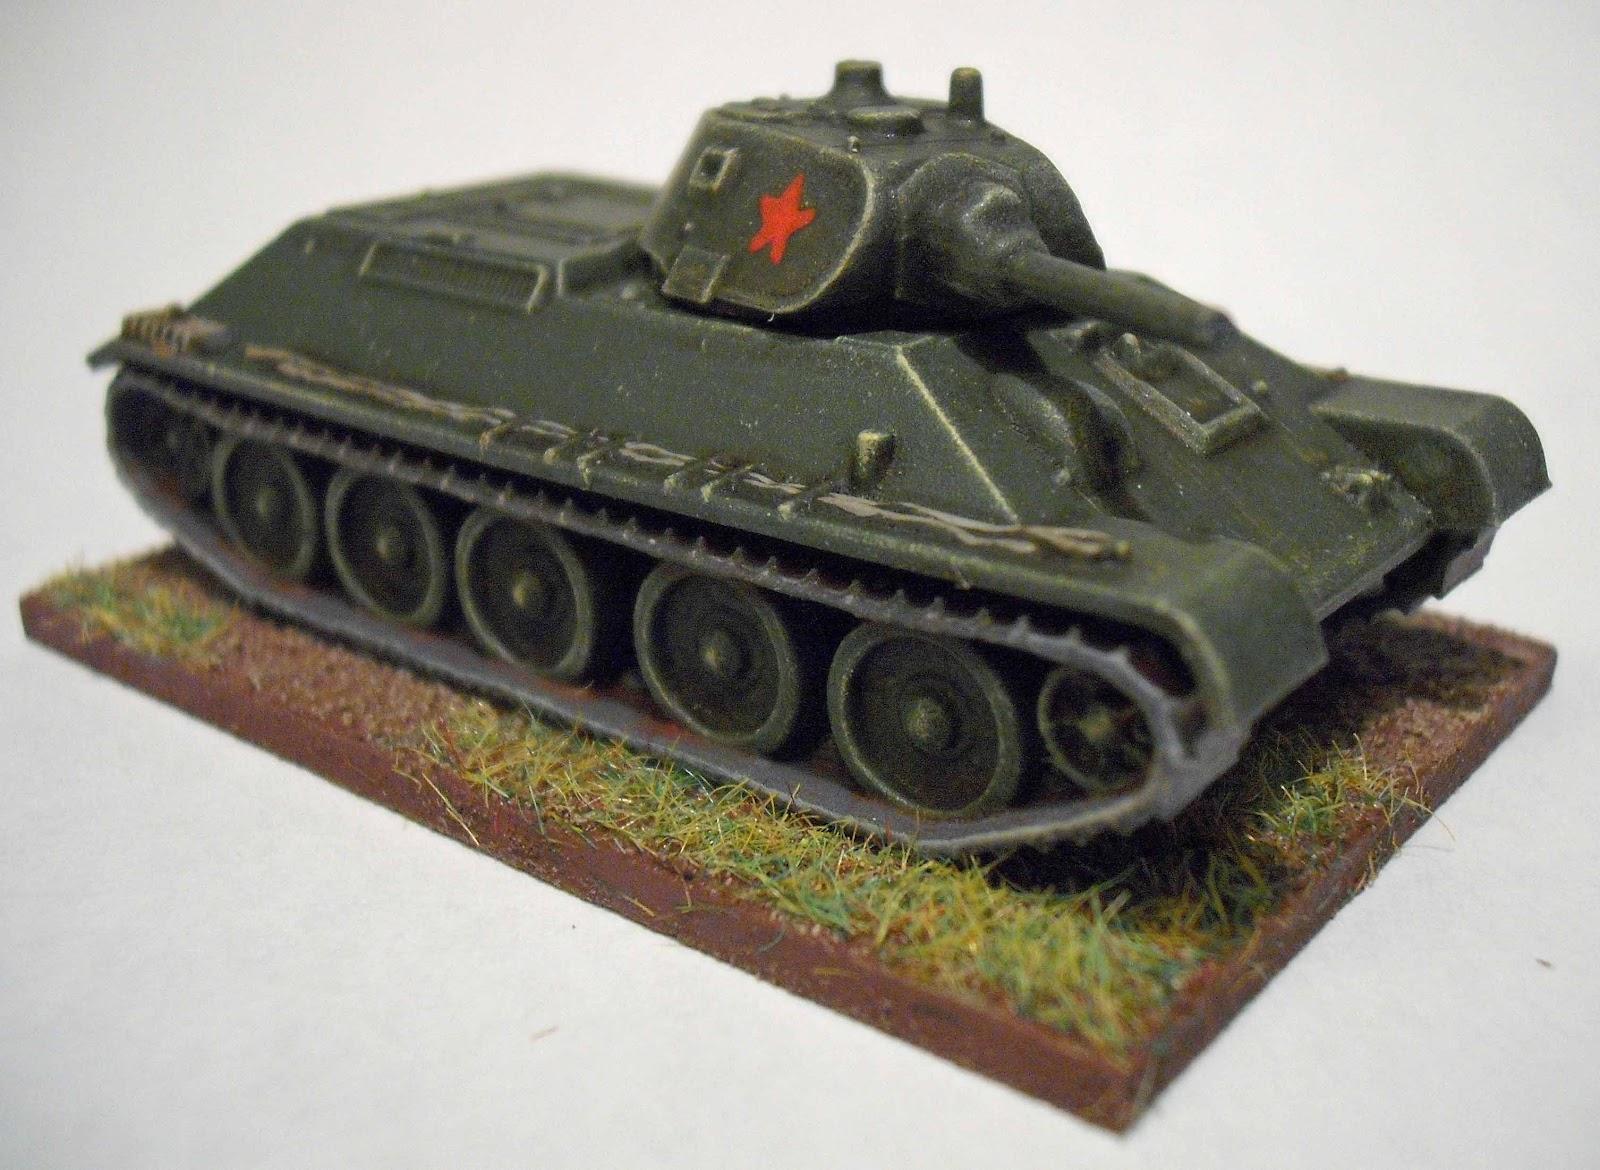 Tim's Tanks: August 2012